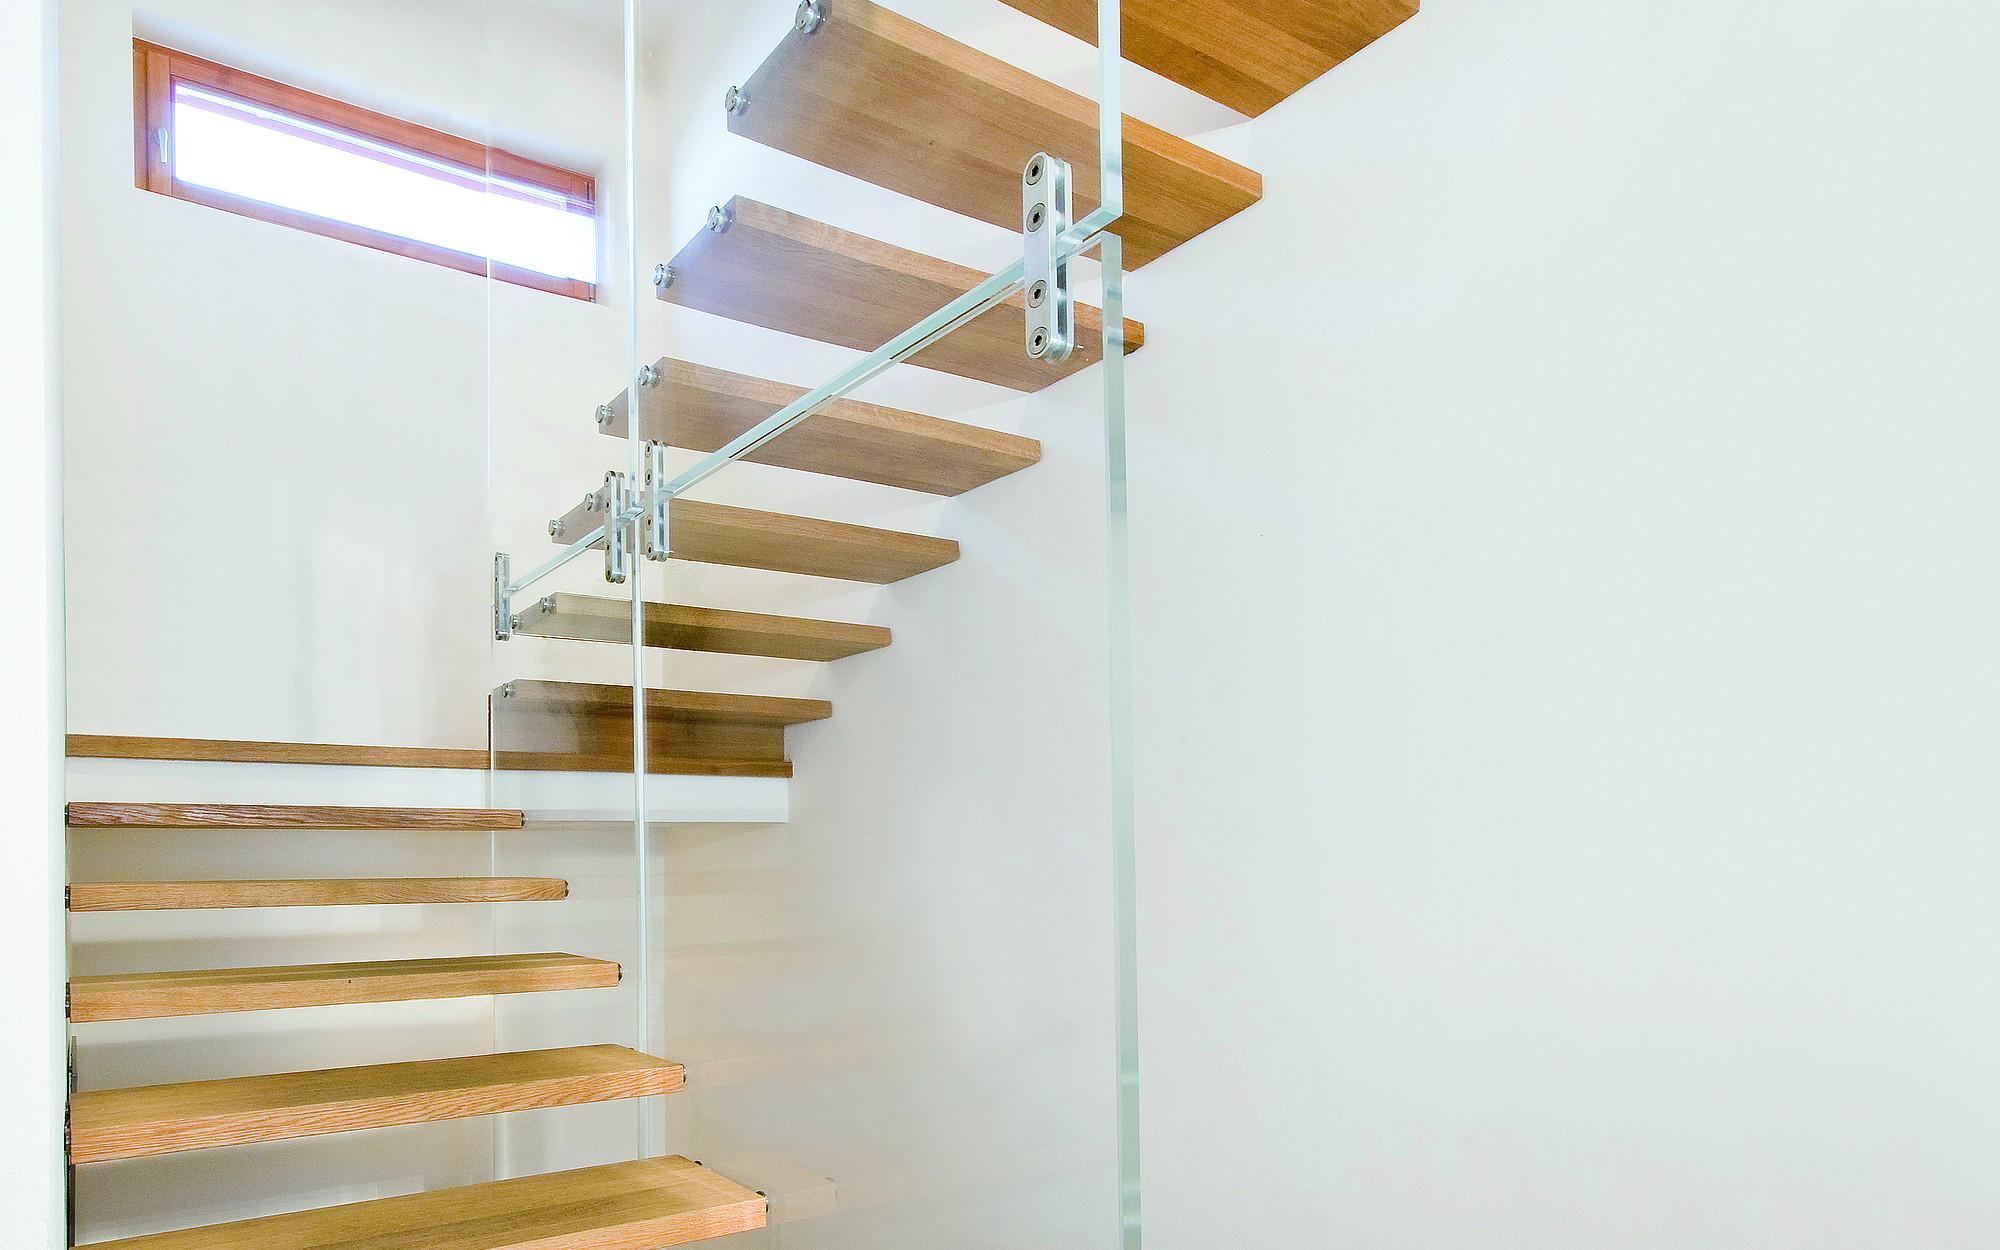 Fabulous Treppe mit Glaswand - Siller Treppen QA02